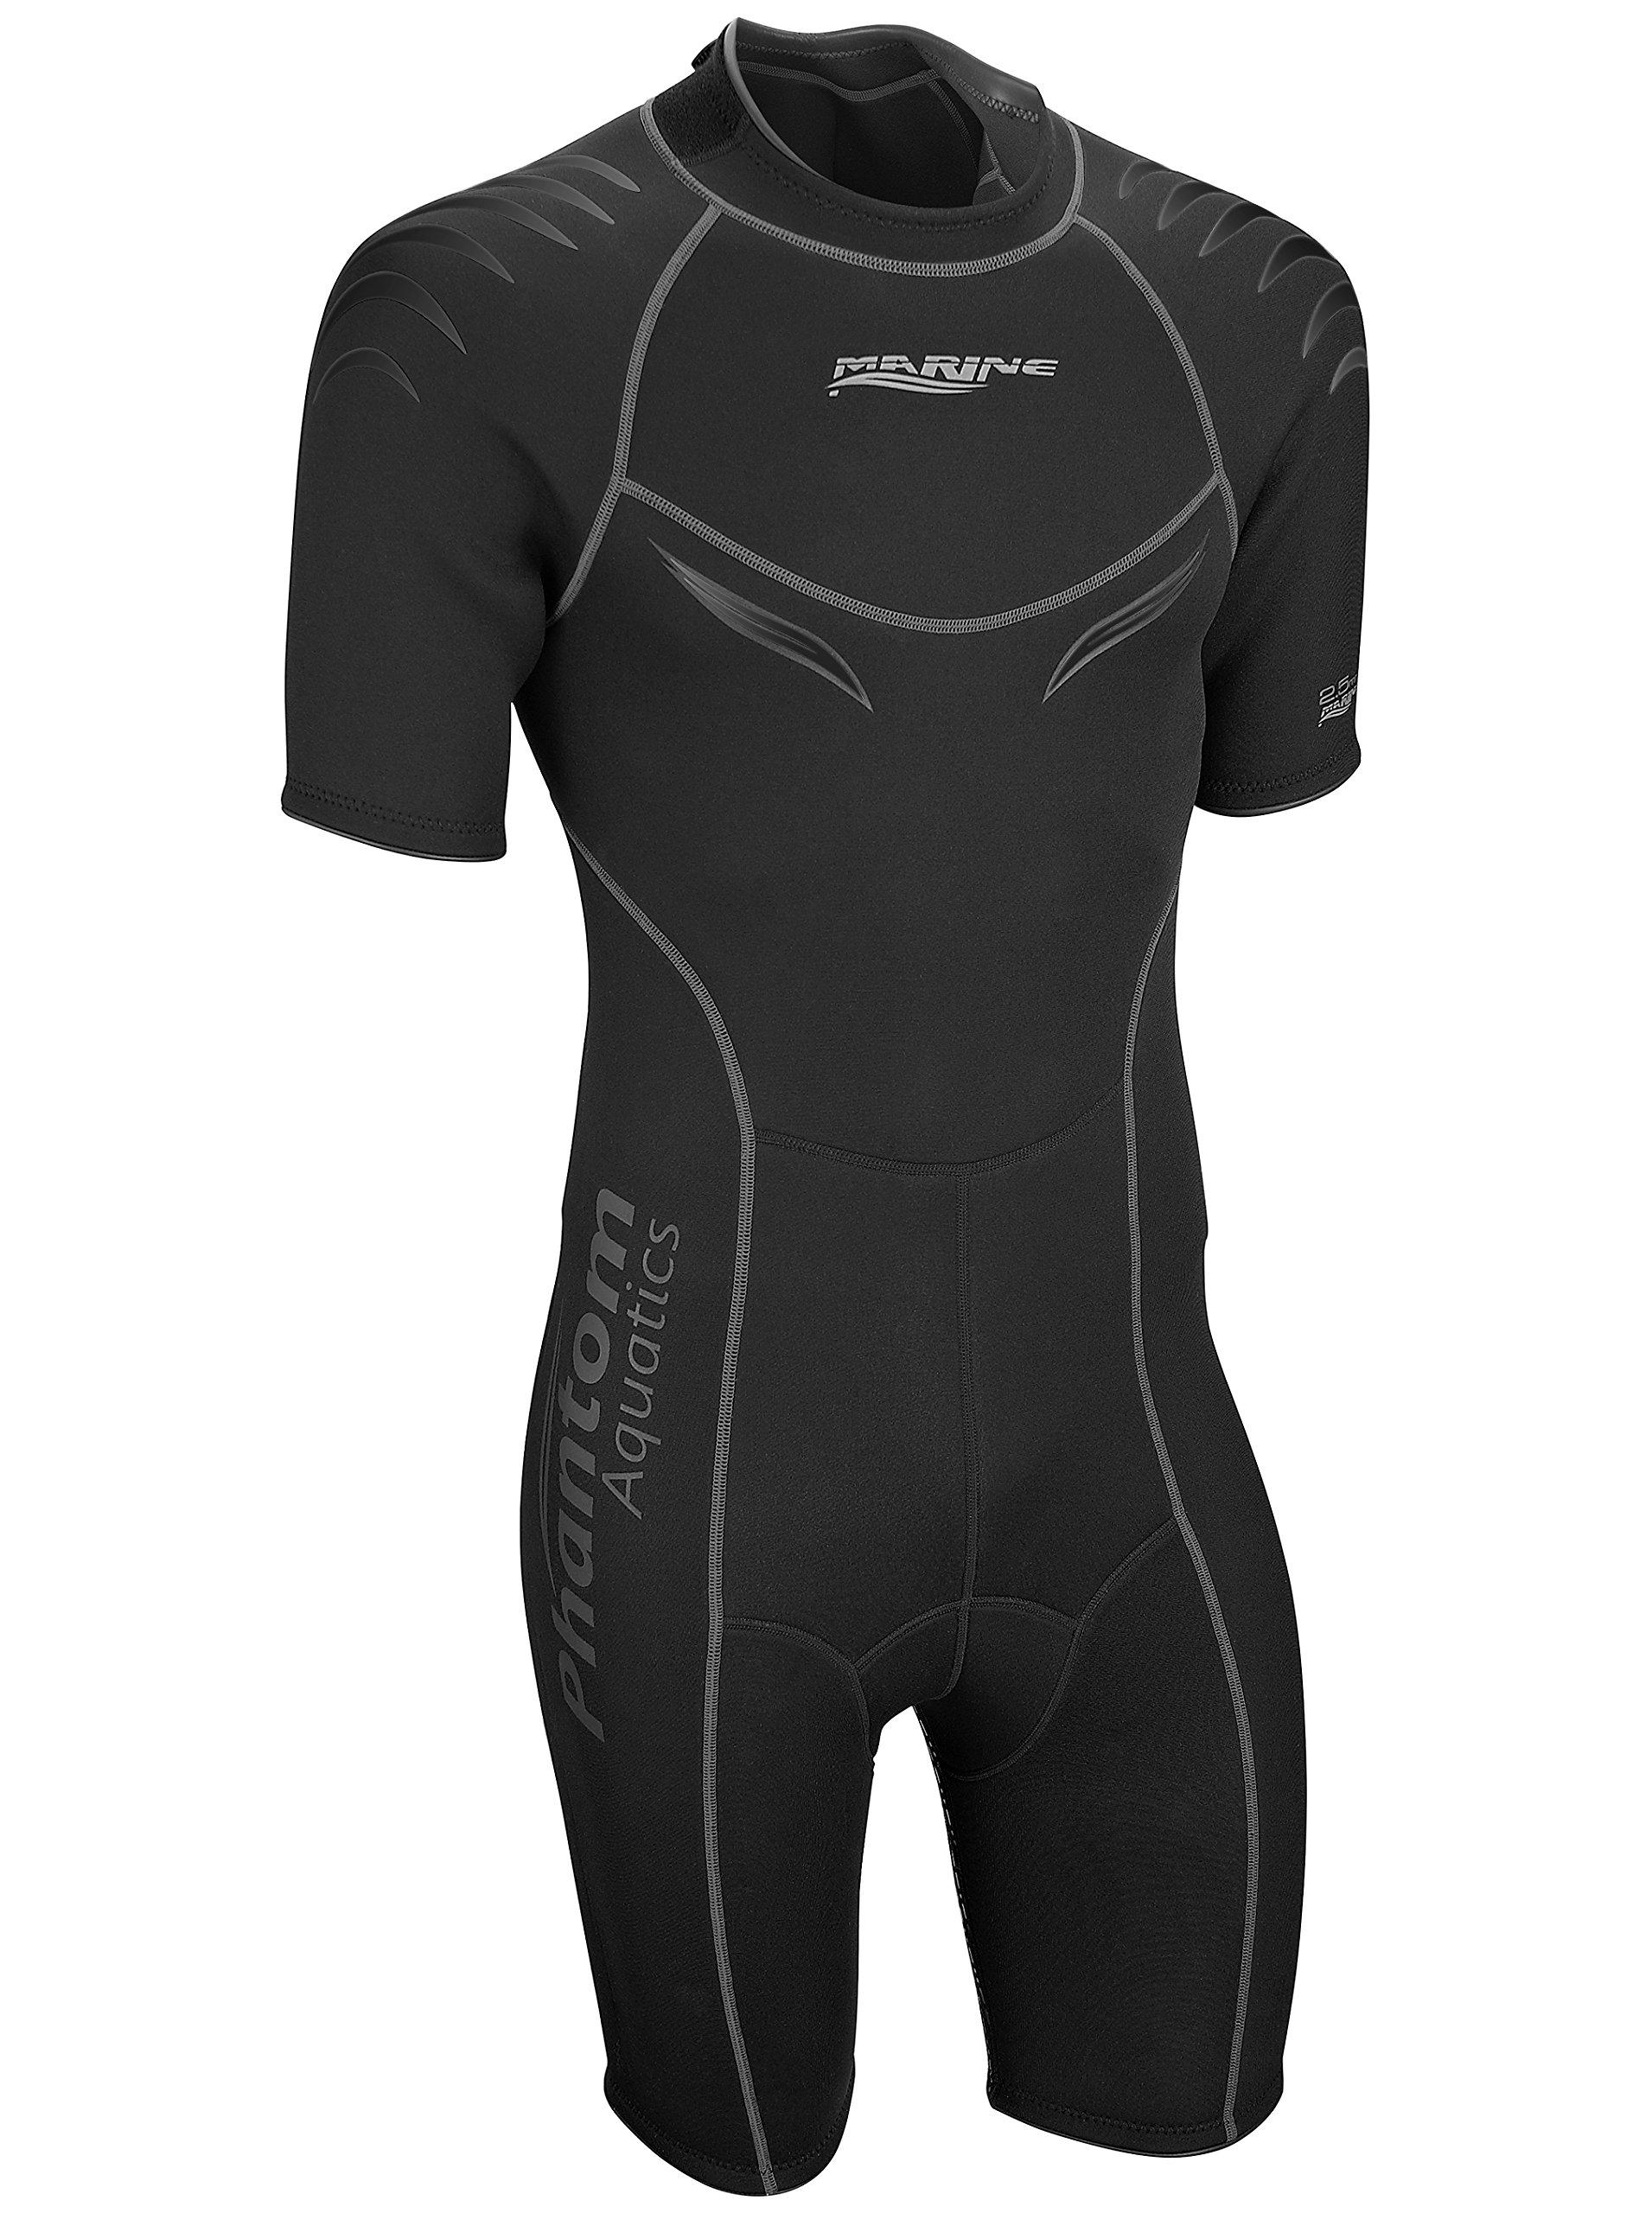 Phantom Aquatics Marine Men's Shorty Wetsuit, All Black - Medium